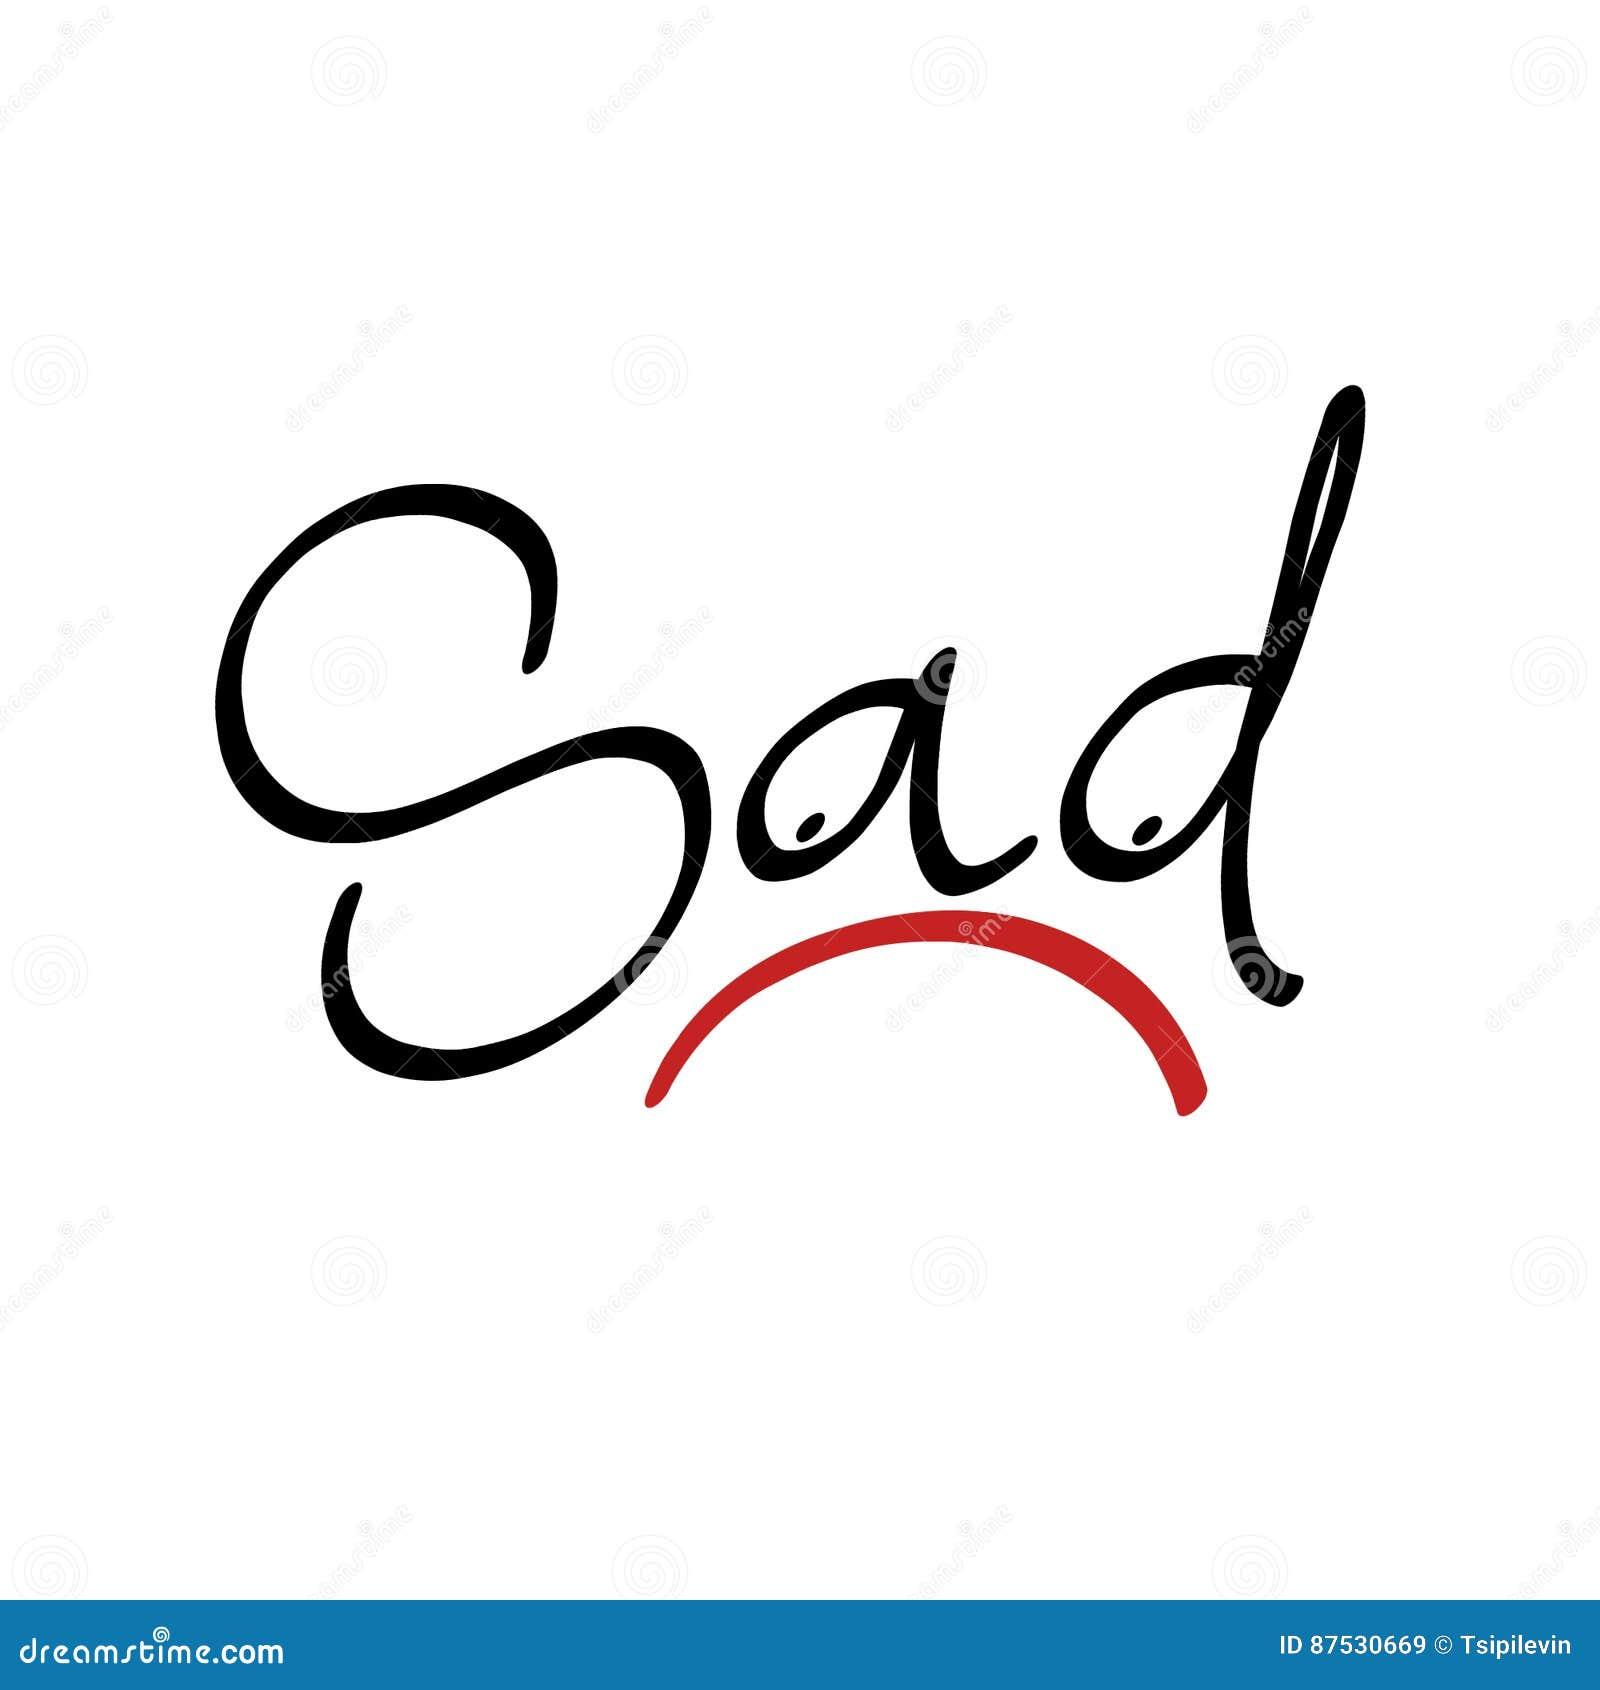 Sad hand lettering text stock illustration. Illustration